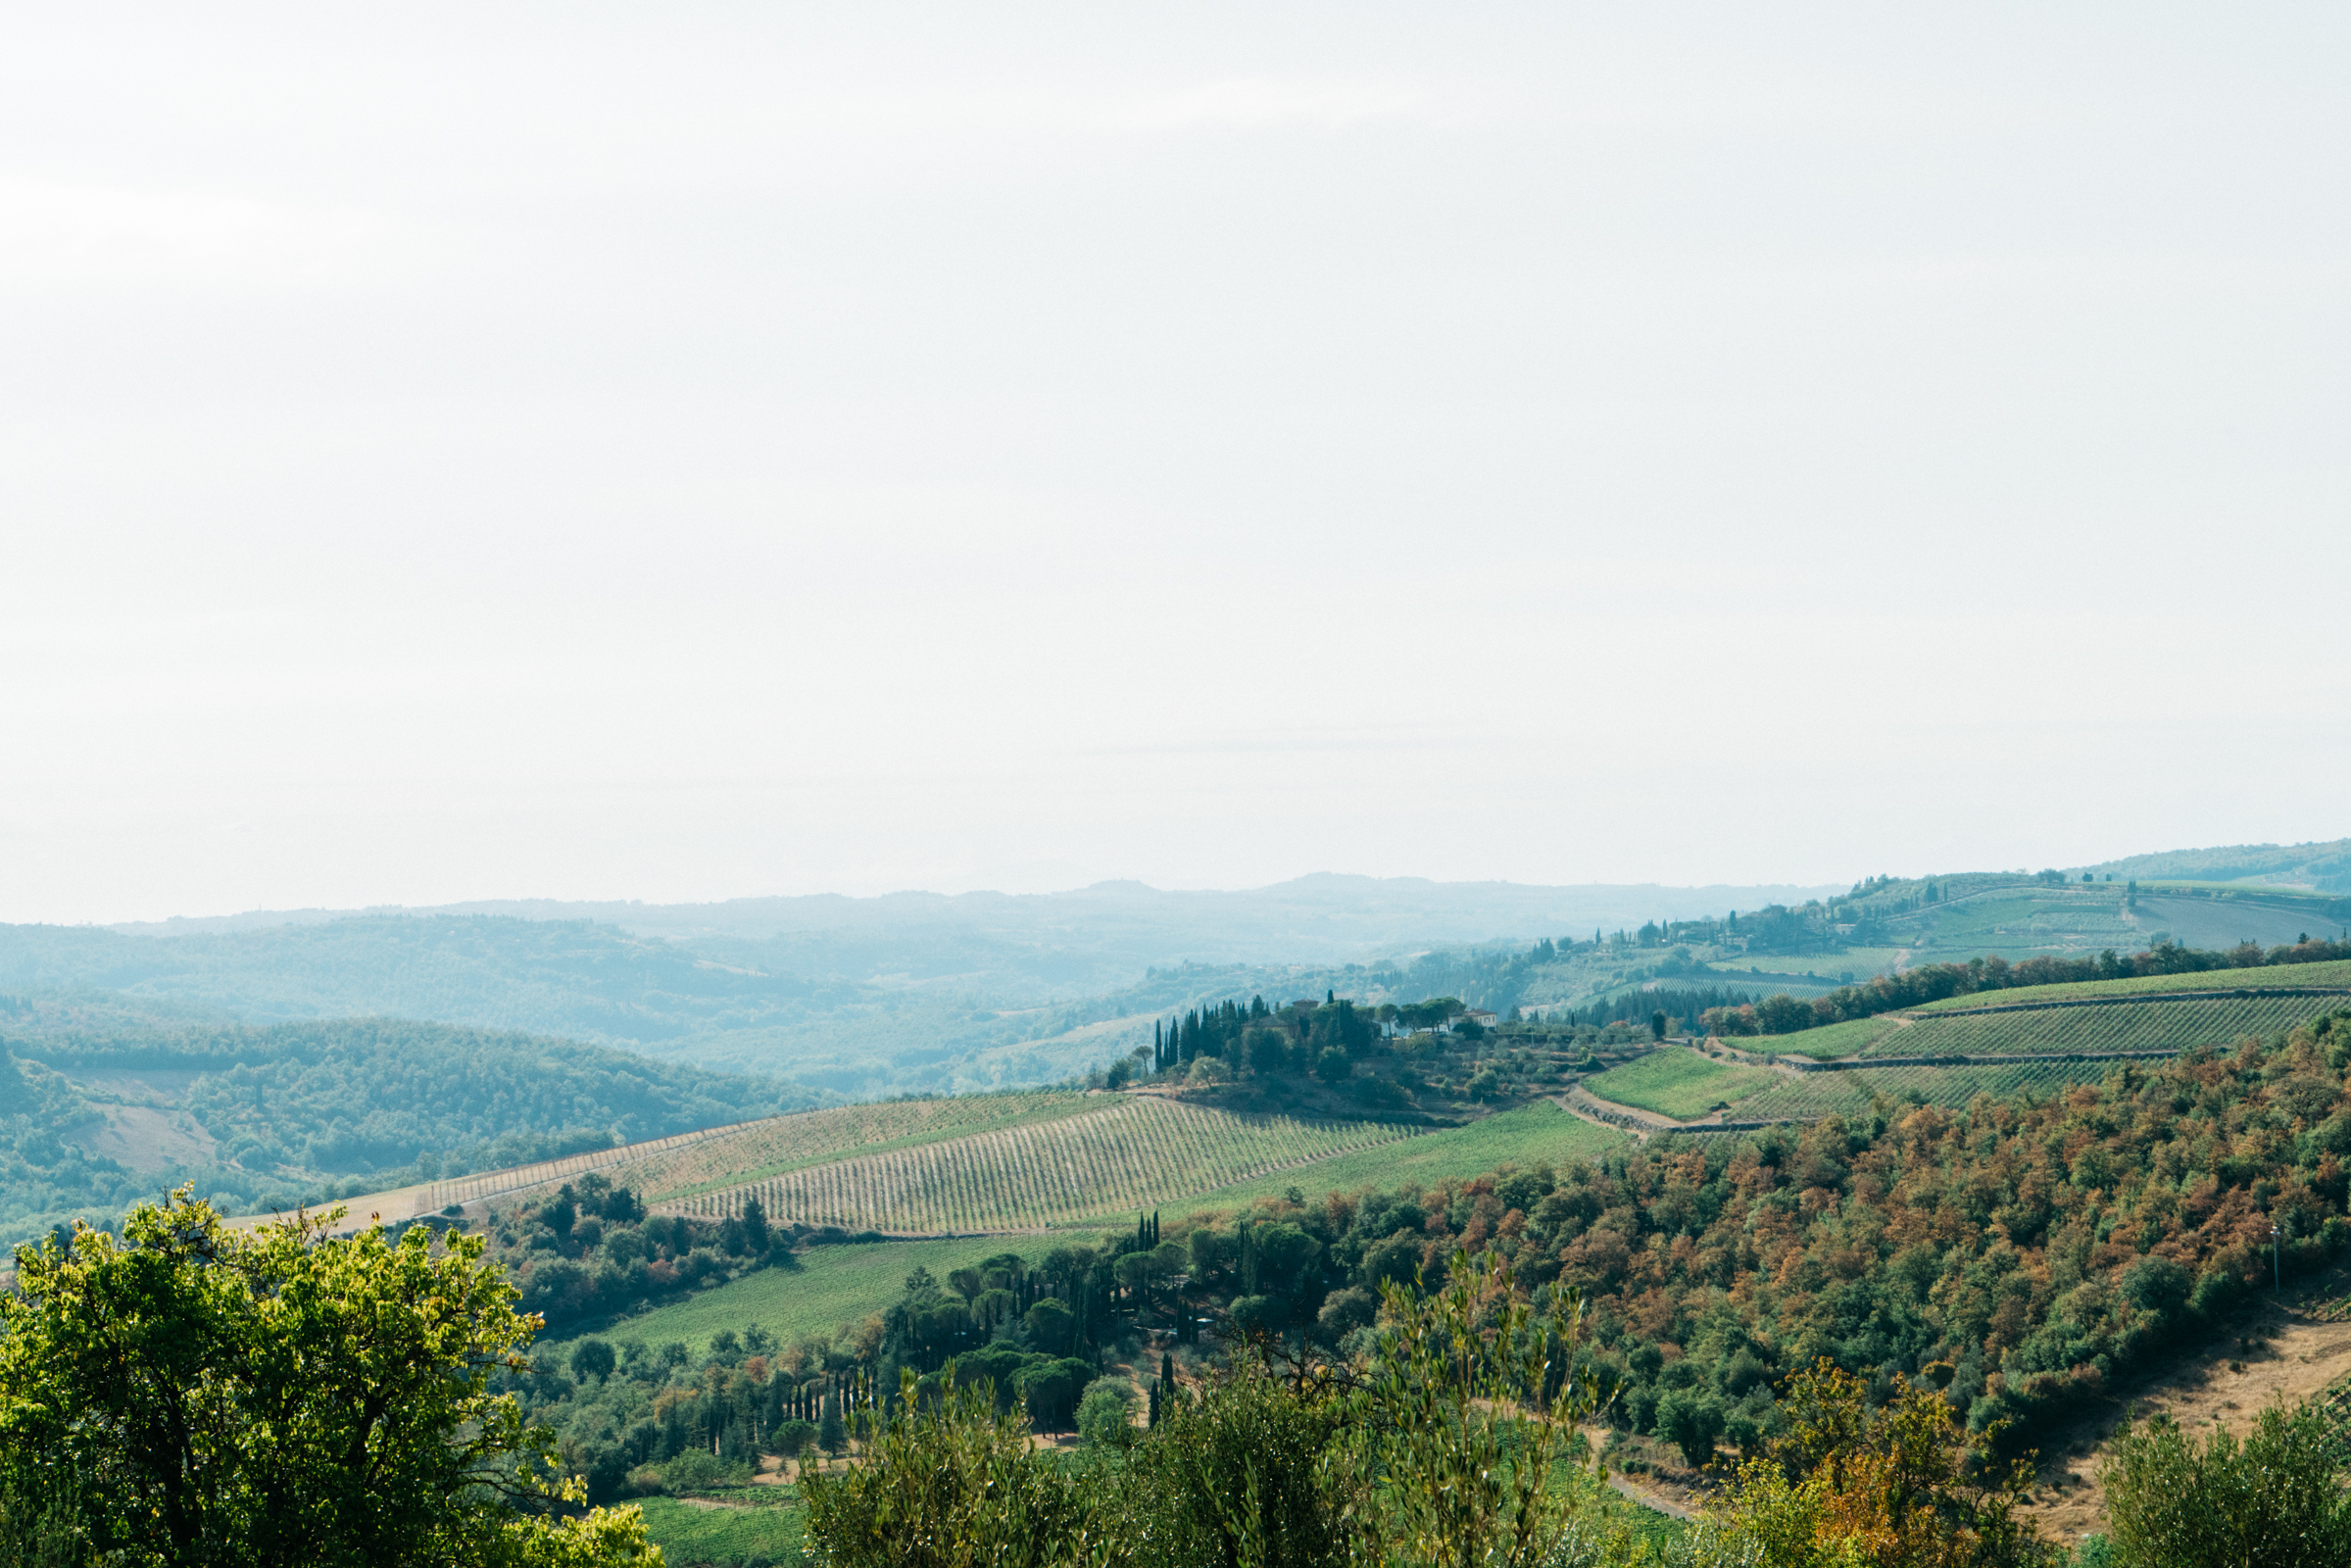 tuscany-14.jpg